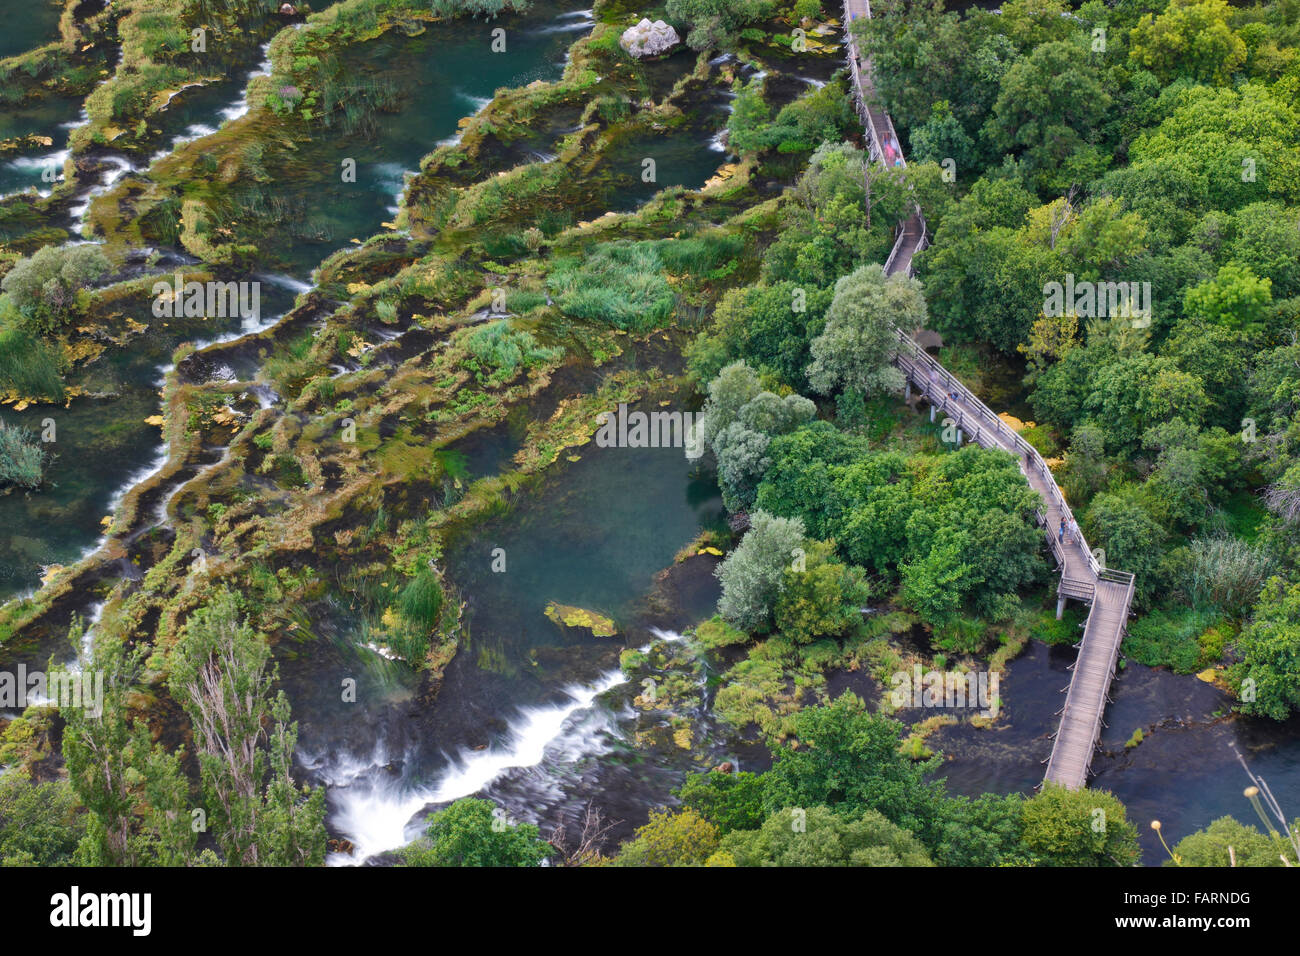 Wooden bridge over river Krka in National park Krka, Croatia Stock Photo